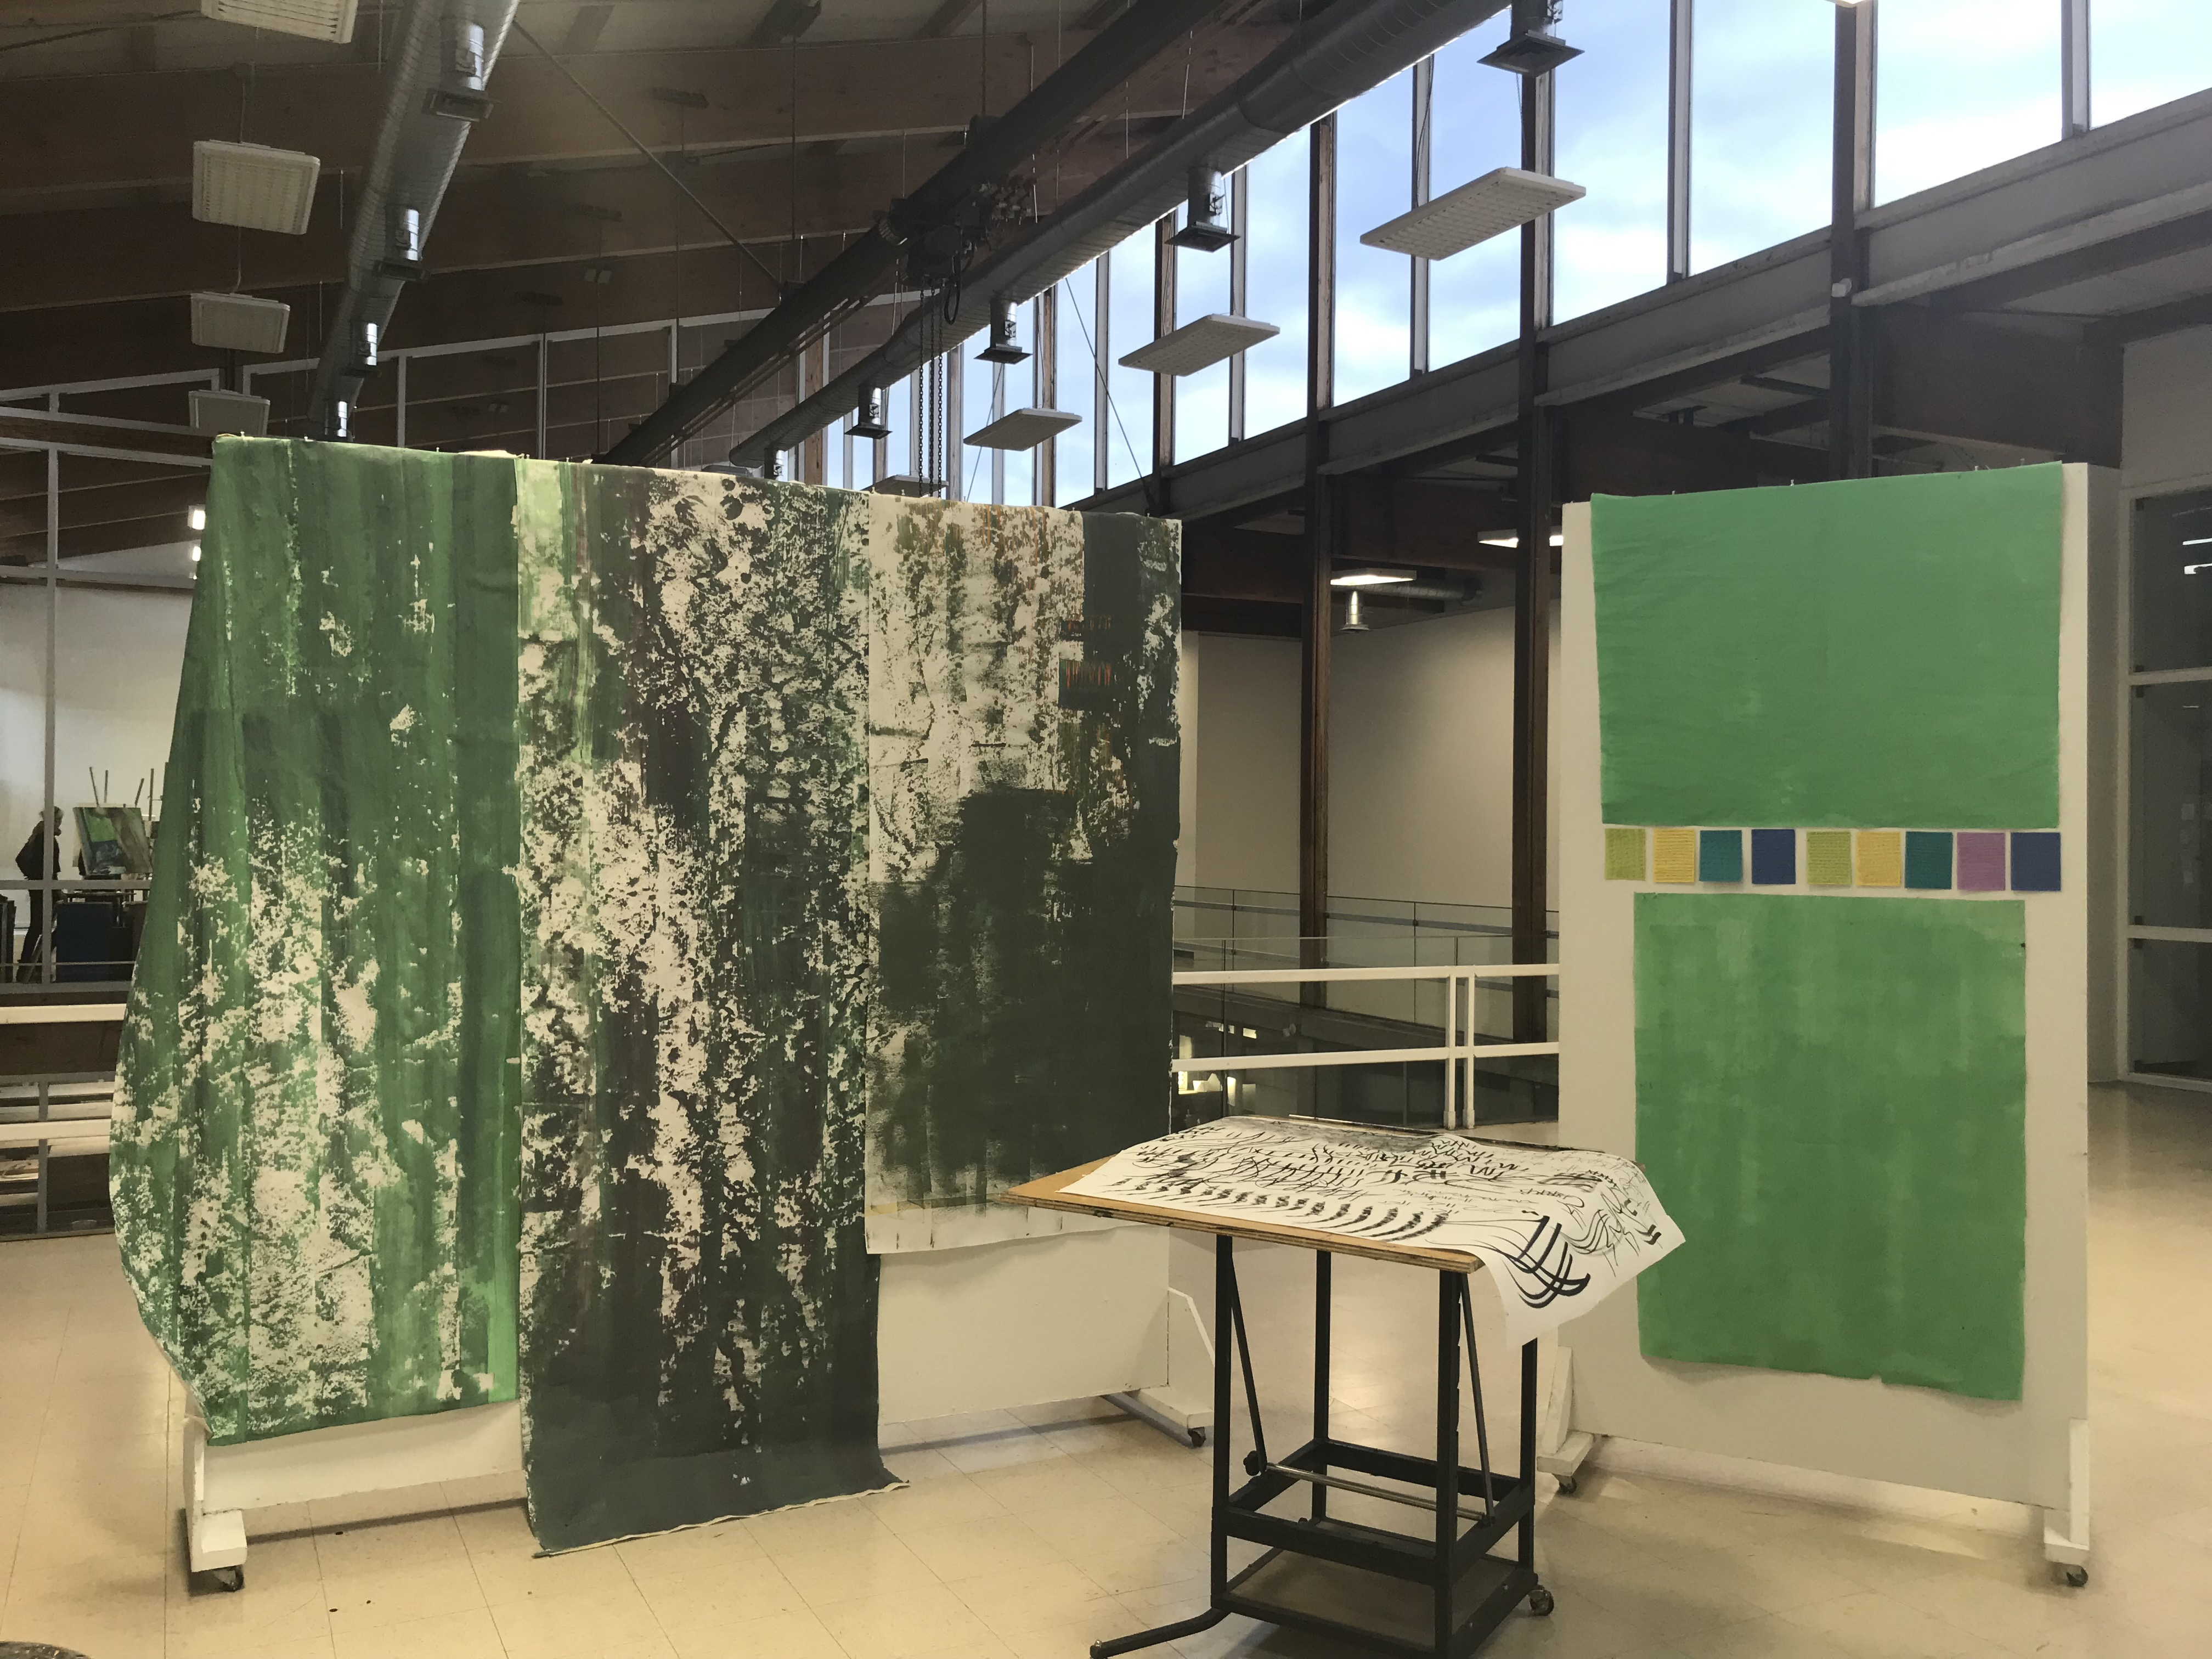 ahmad-yassir-artist-green-installation